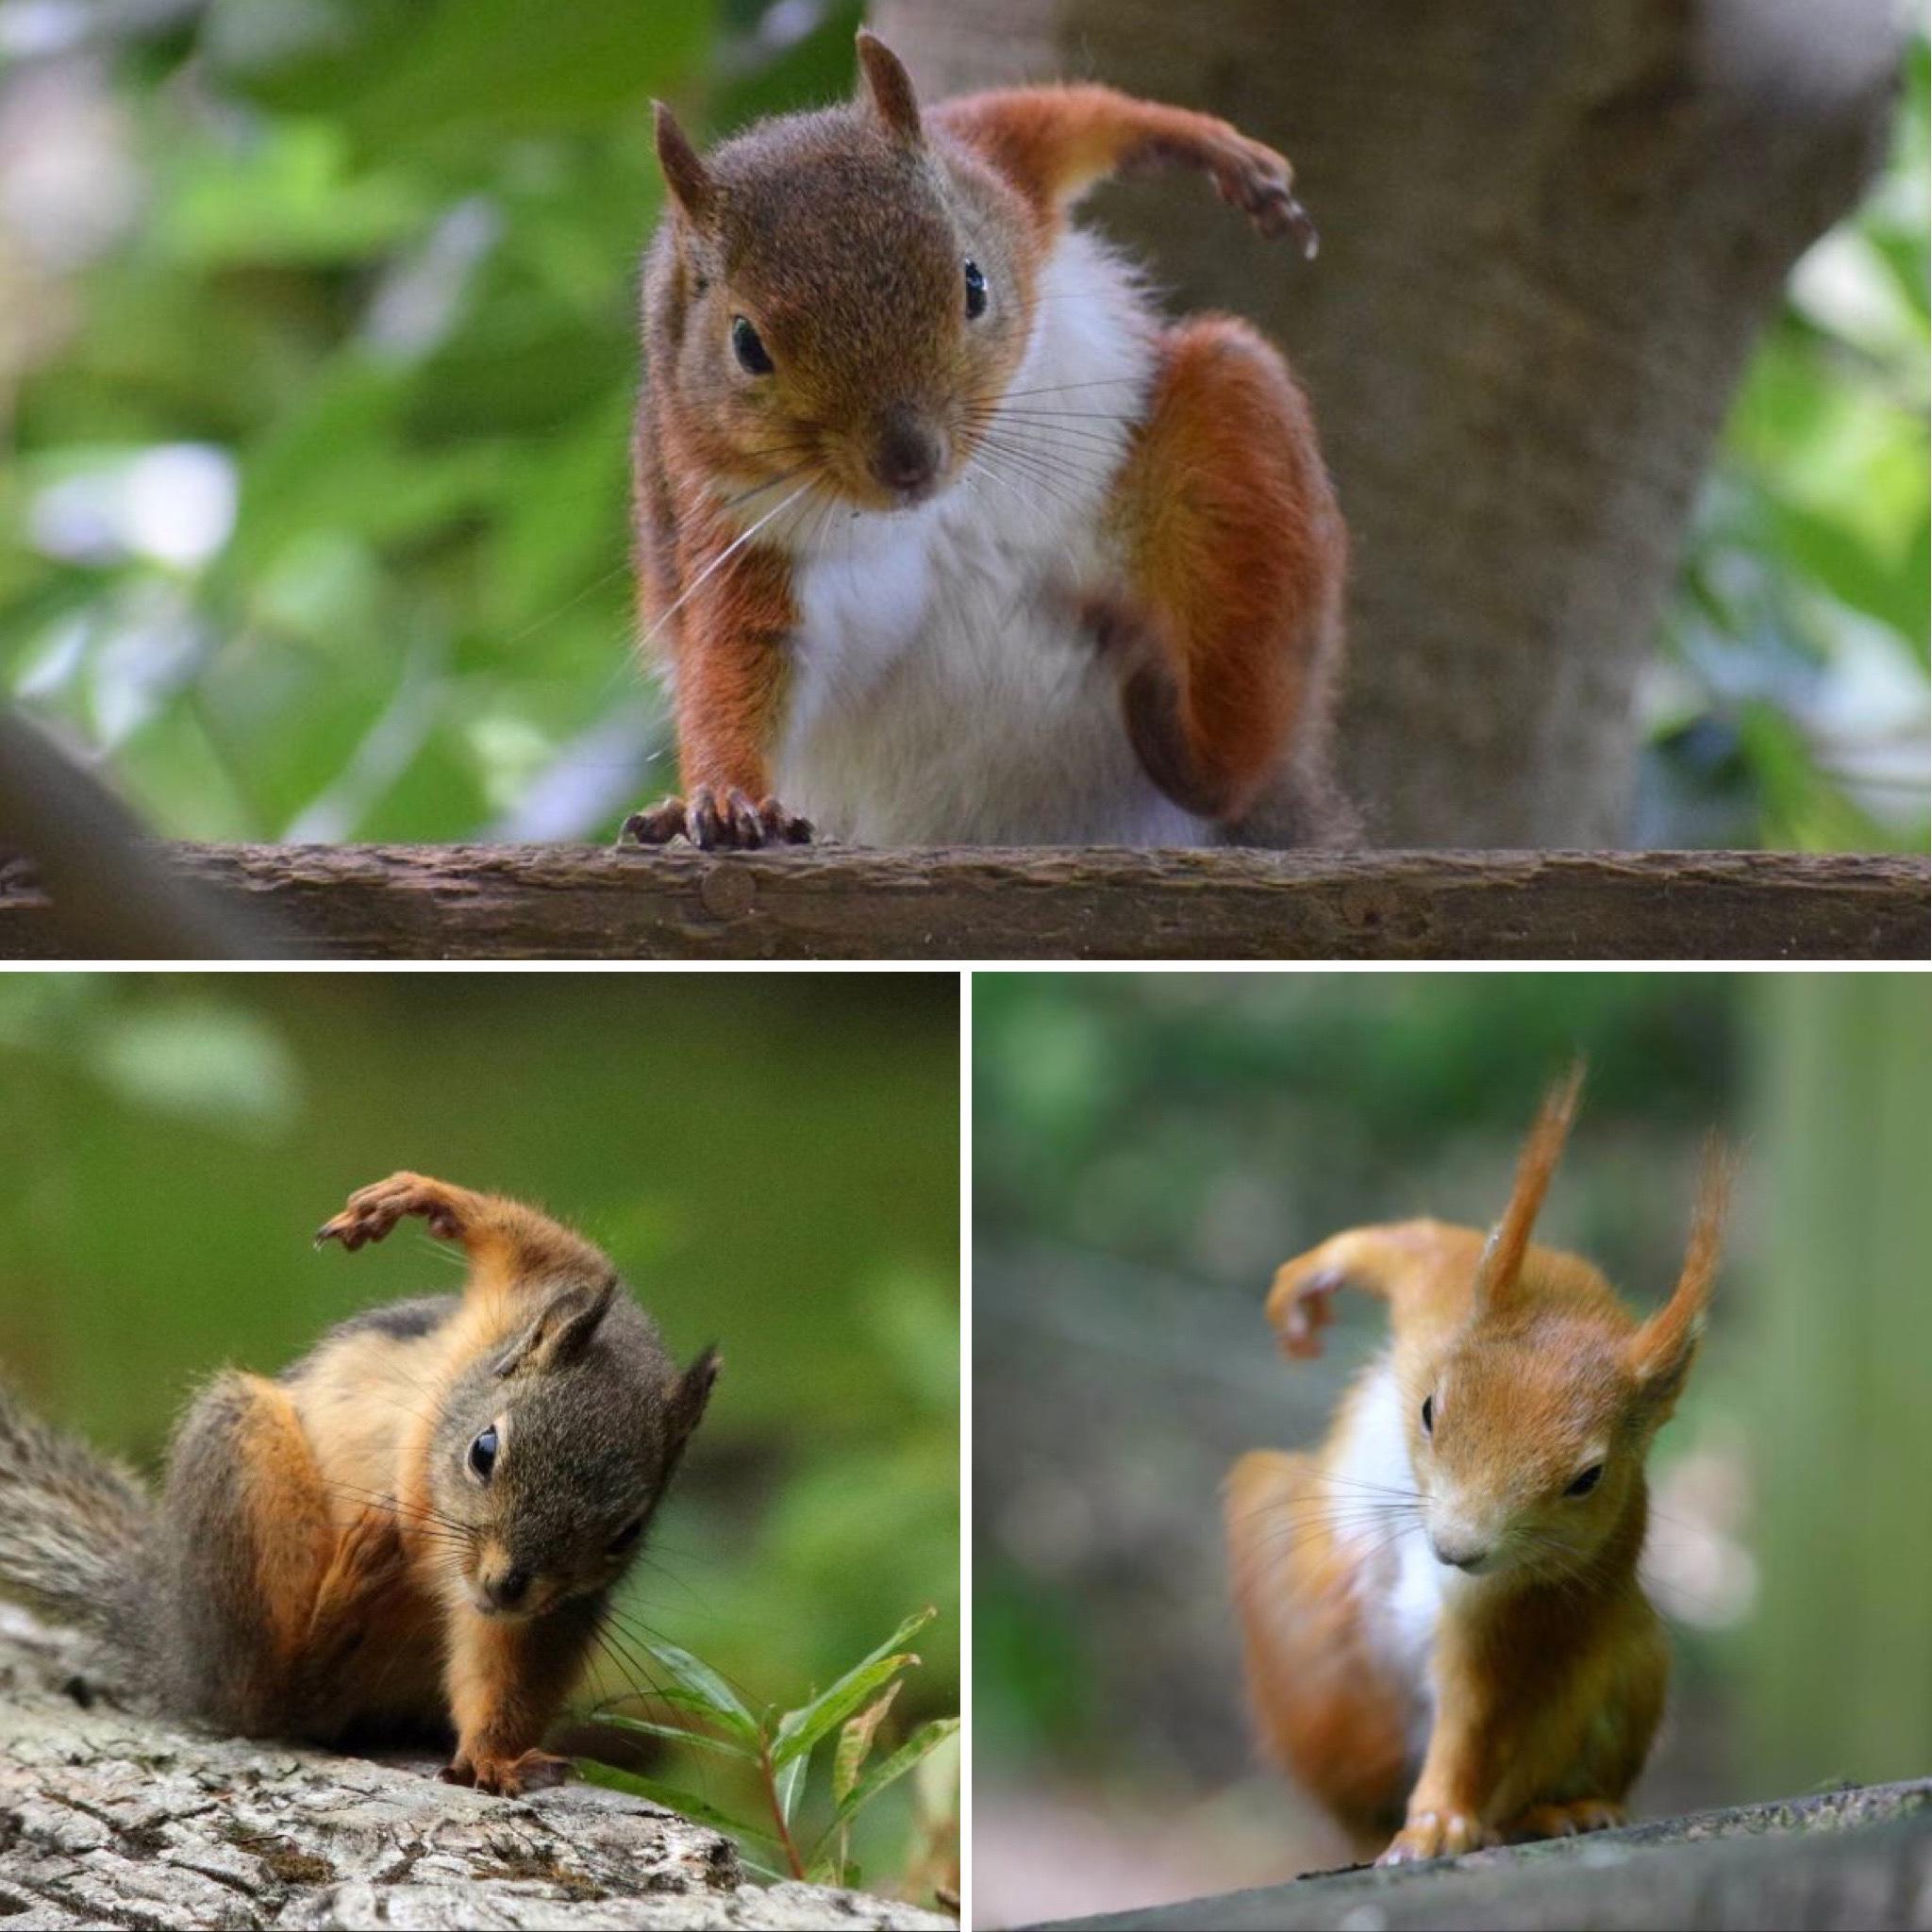 Images of Squirrels in Superhero Poses